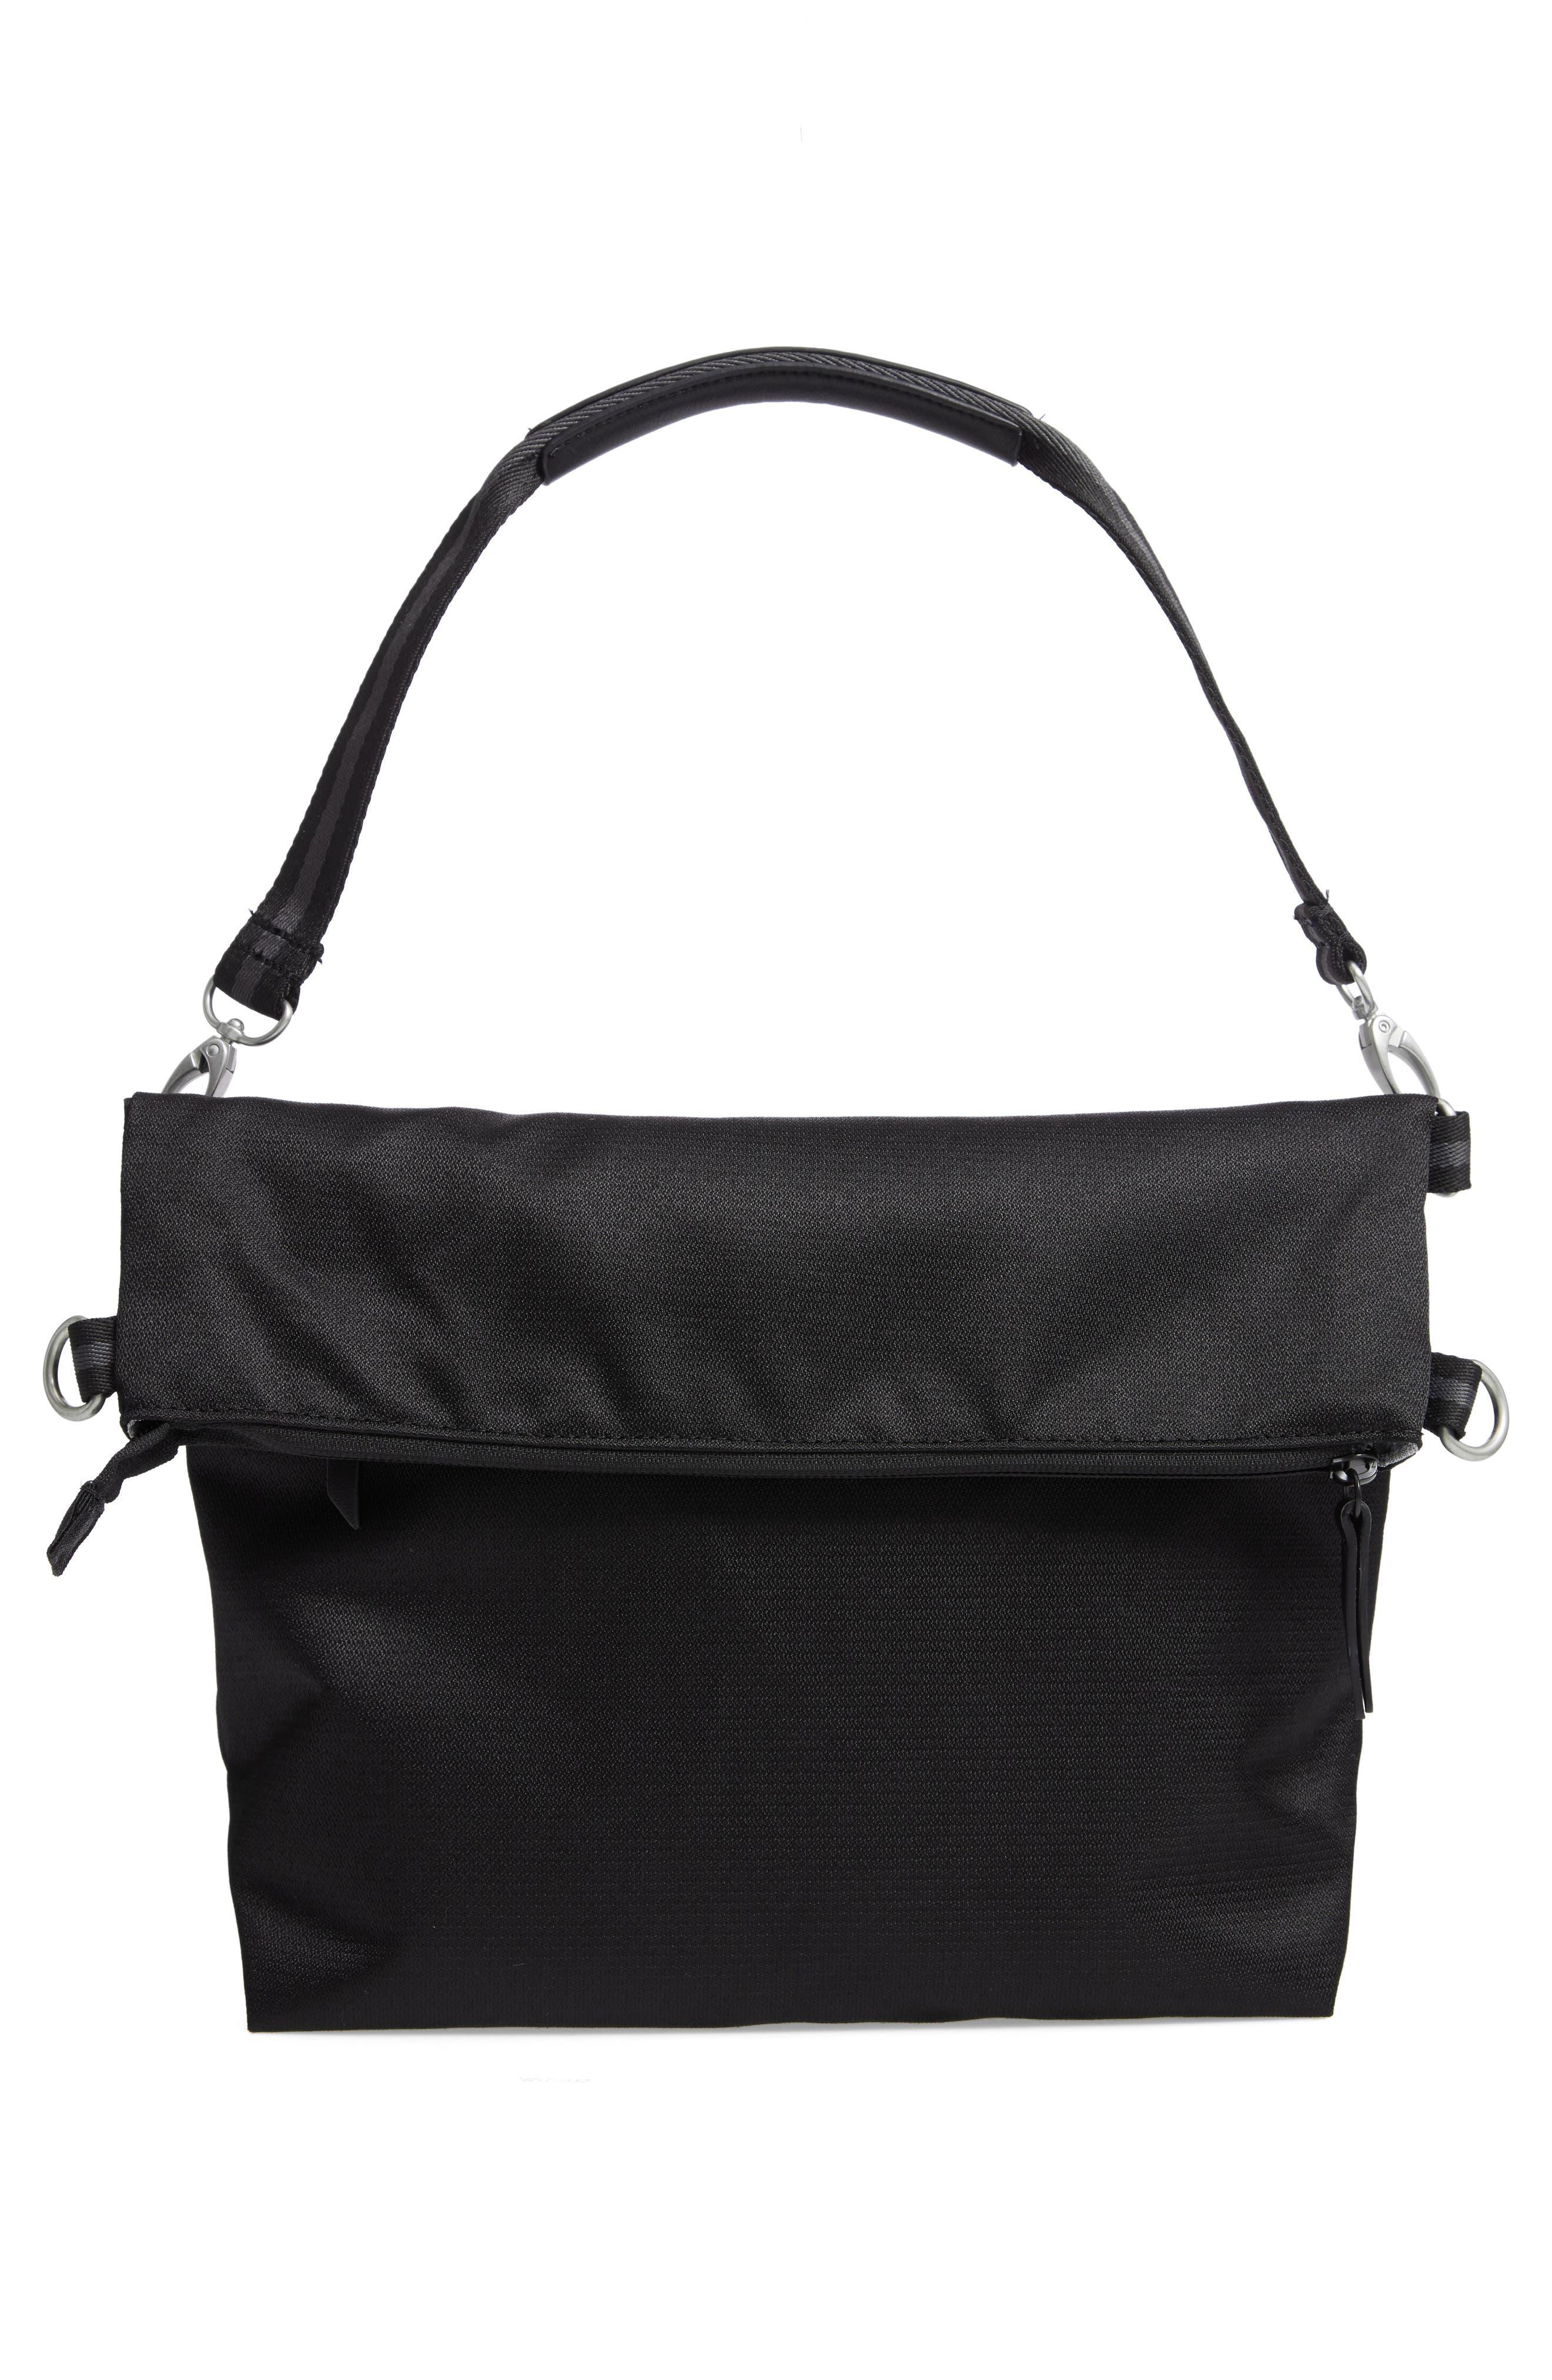 Vale RFID Crossbody Bag,                             Alternate thumbnail 3, color,                             BLACK/ BLACK